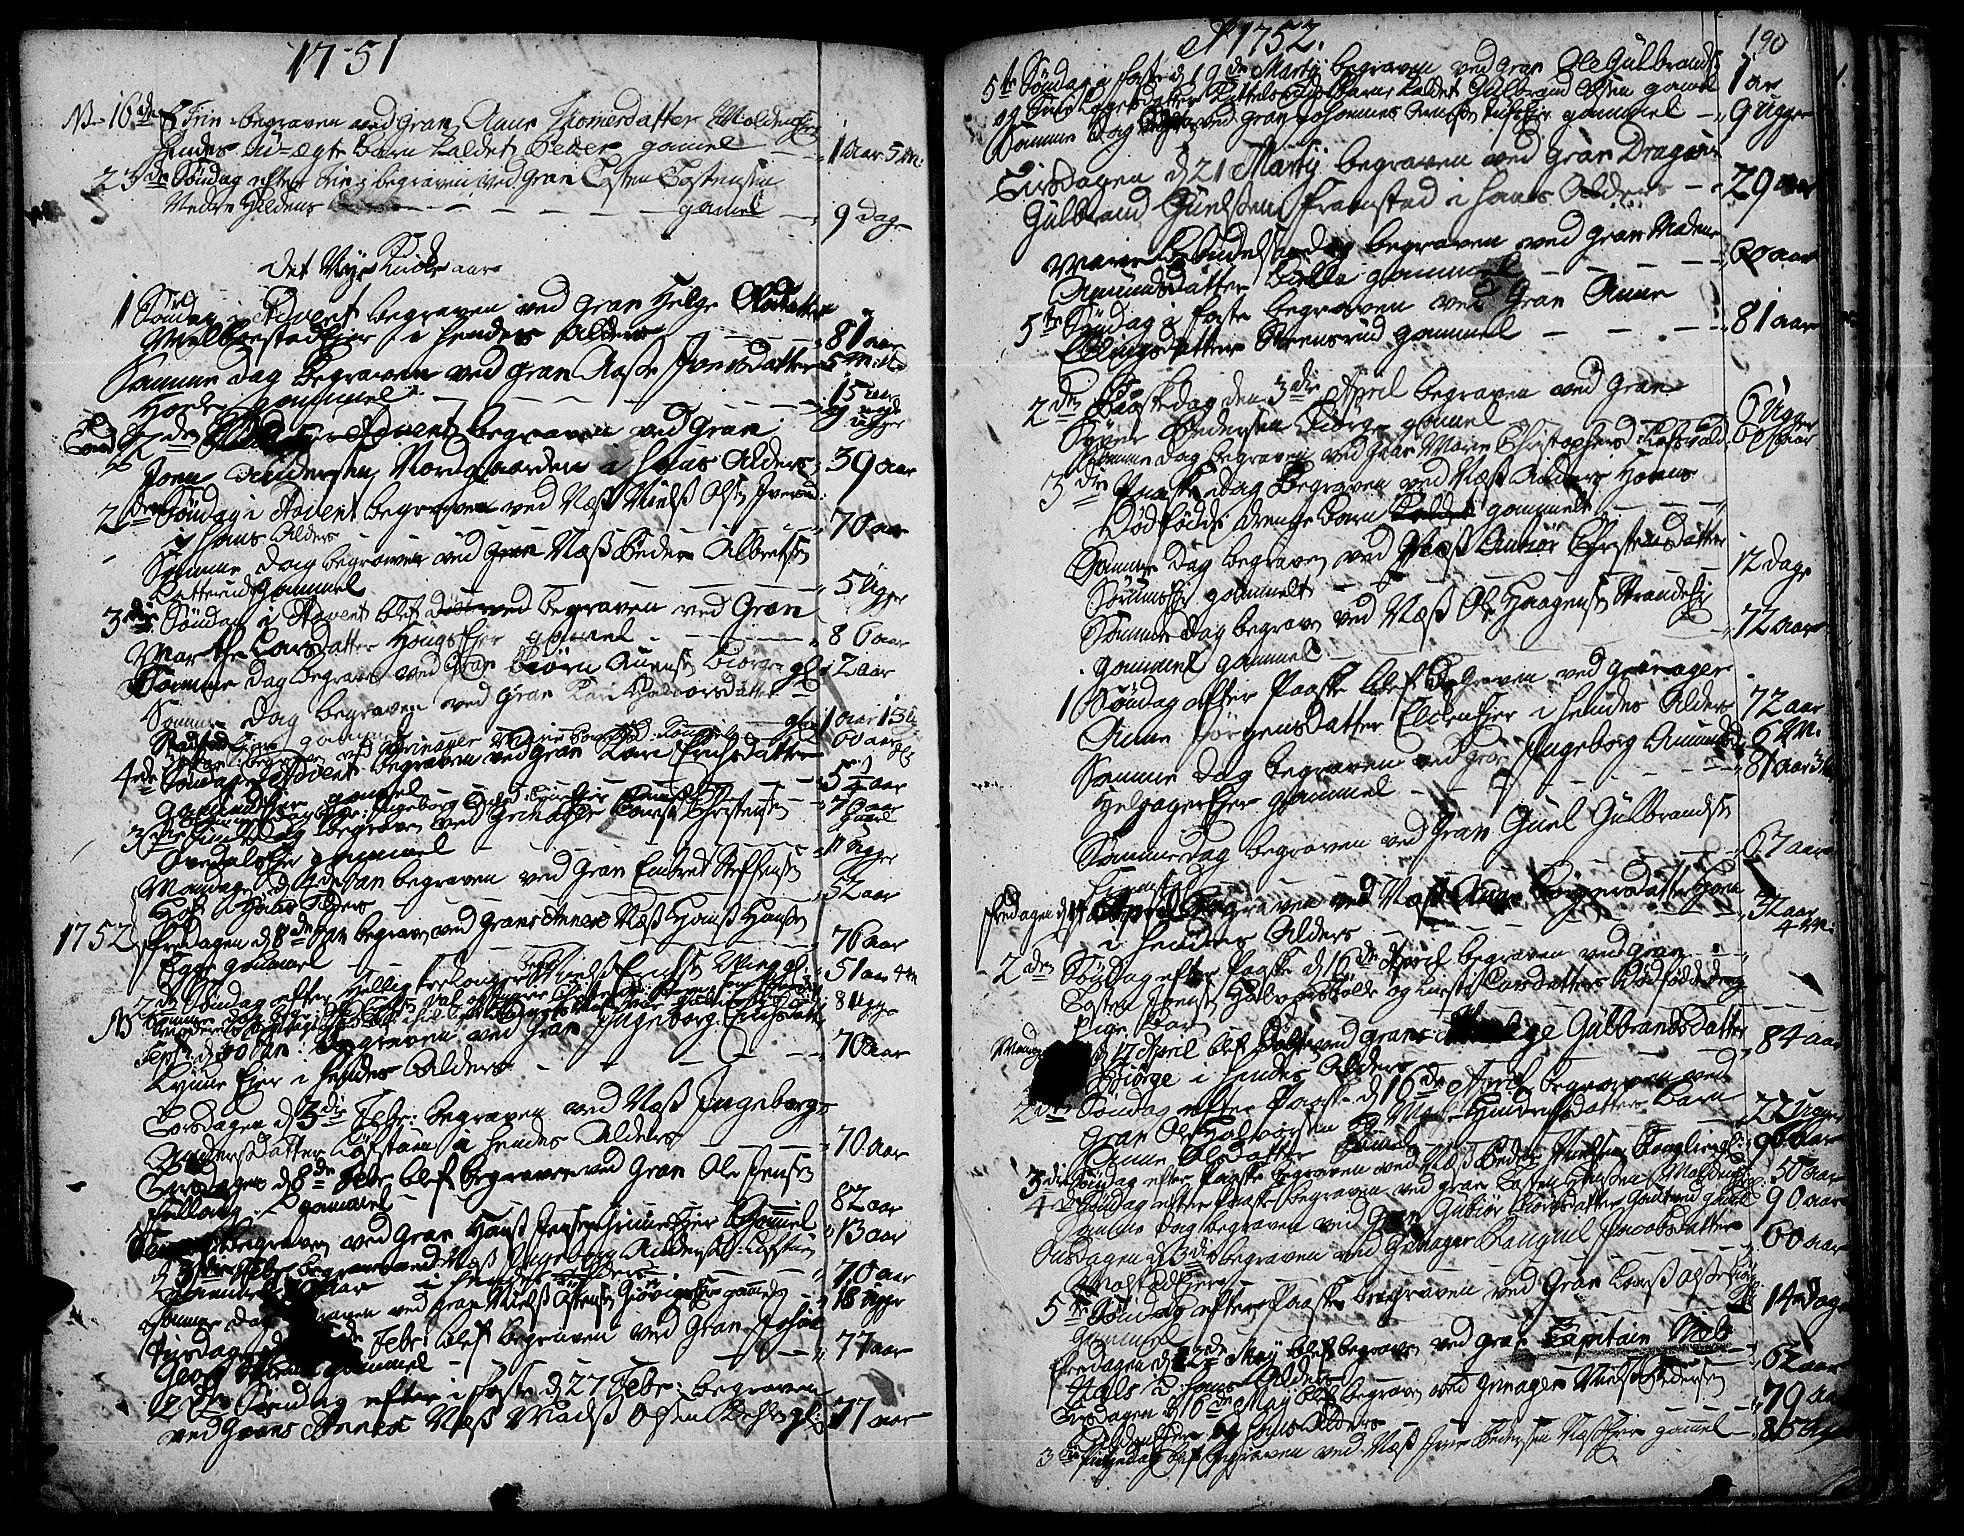 SAH, Gran prestekontor, Ministerialbok nr. 3, 1745-1758, s. 190